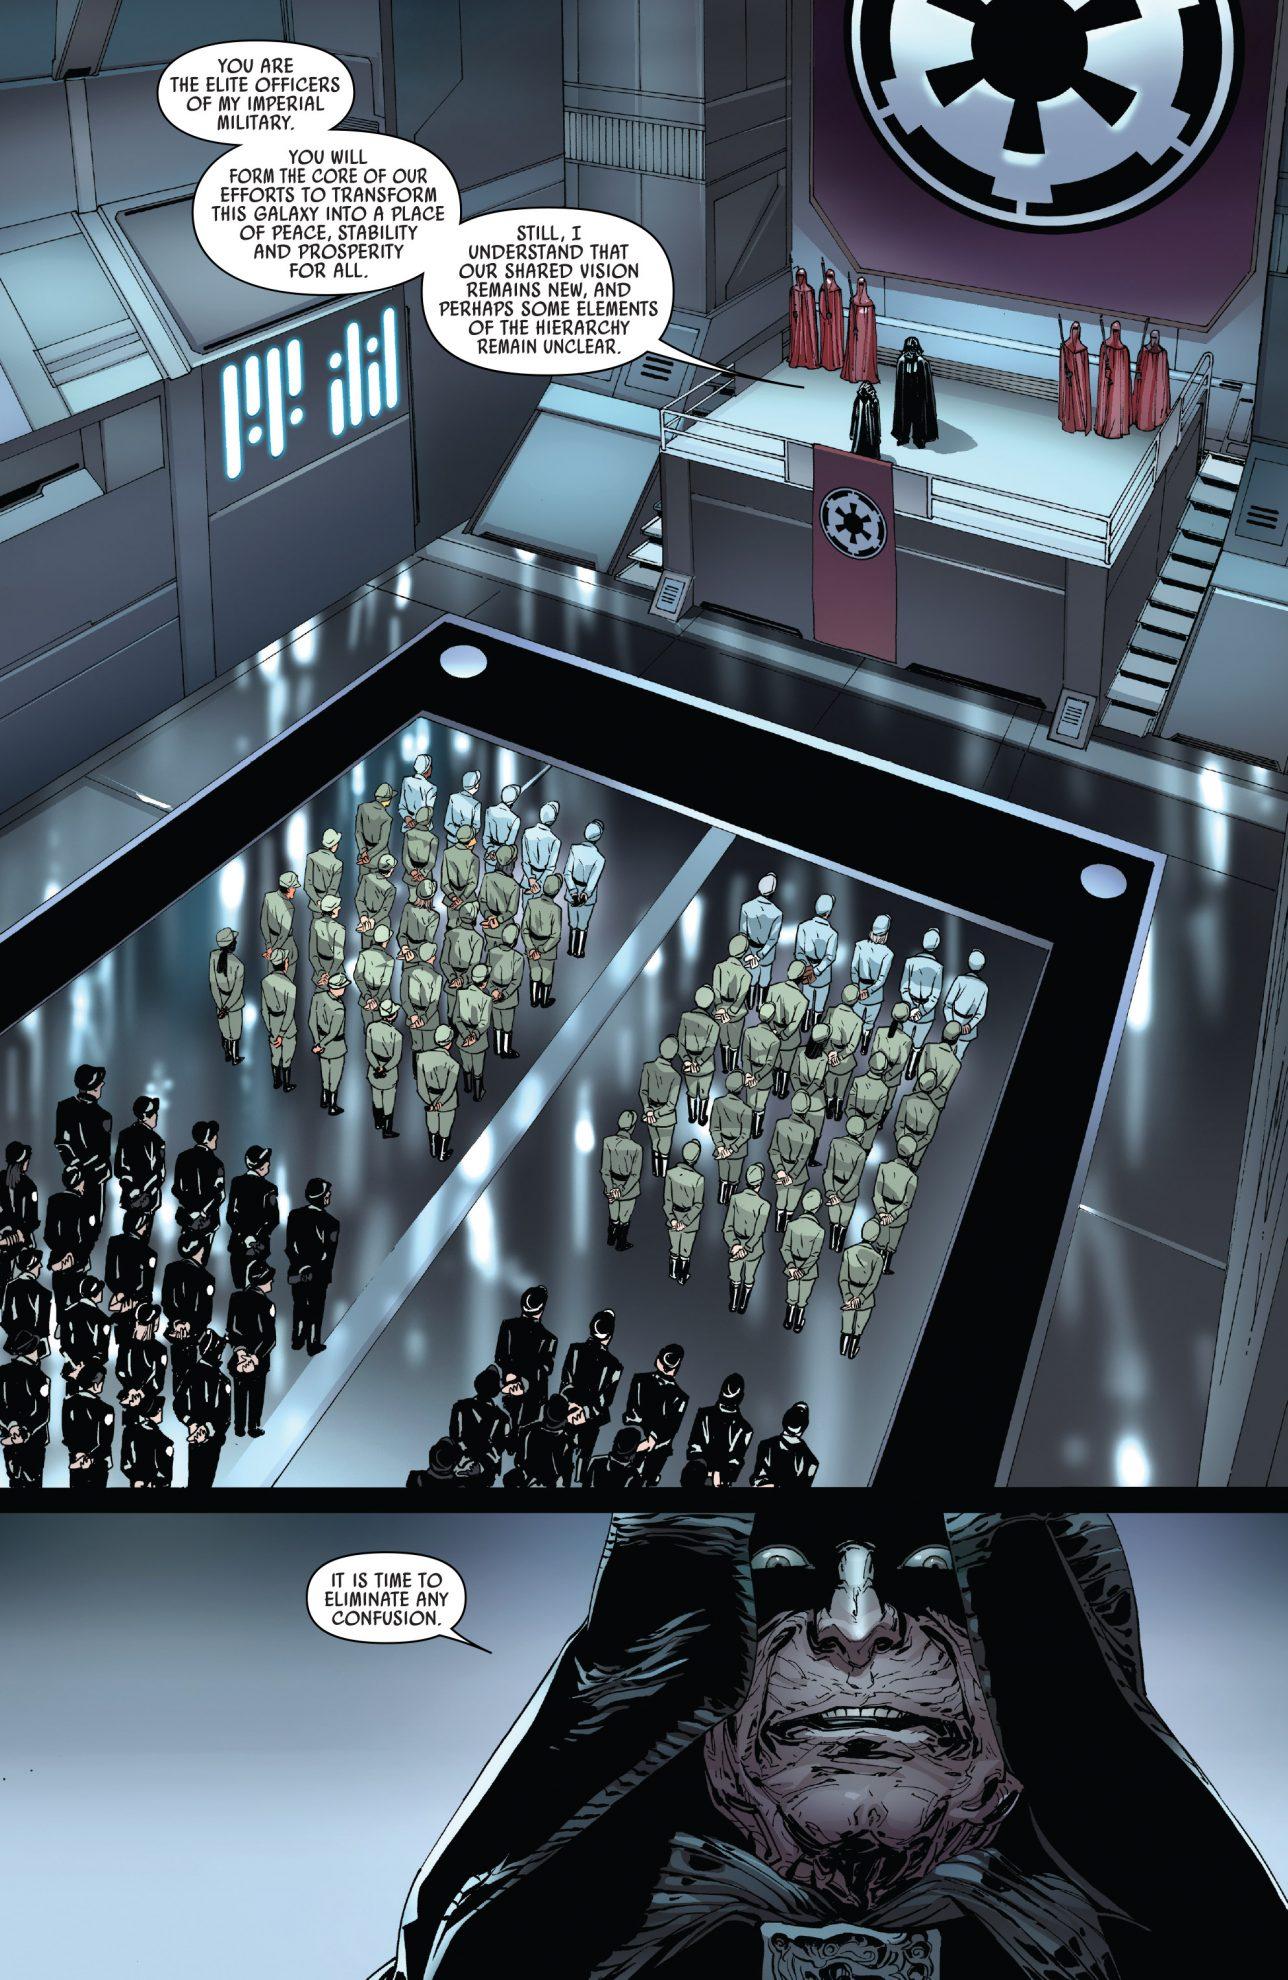 Darth Vader Executes Random Imperial Officers